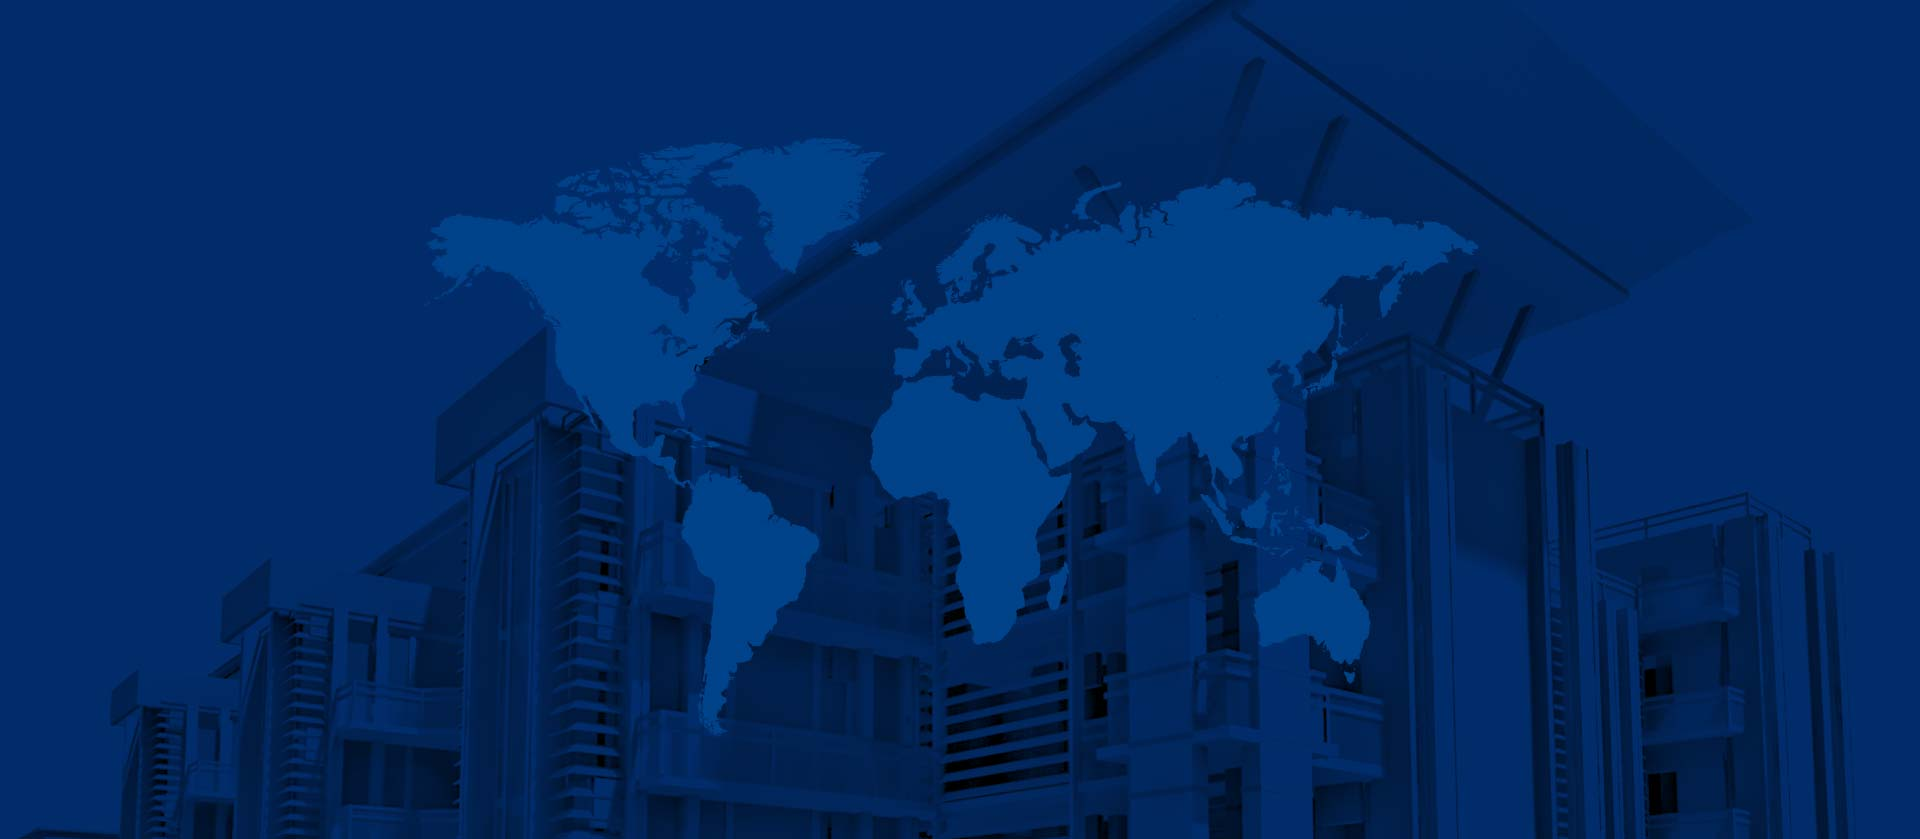 Your Sales Development Partner